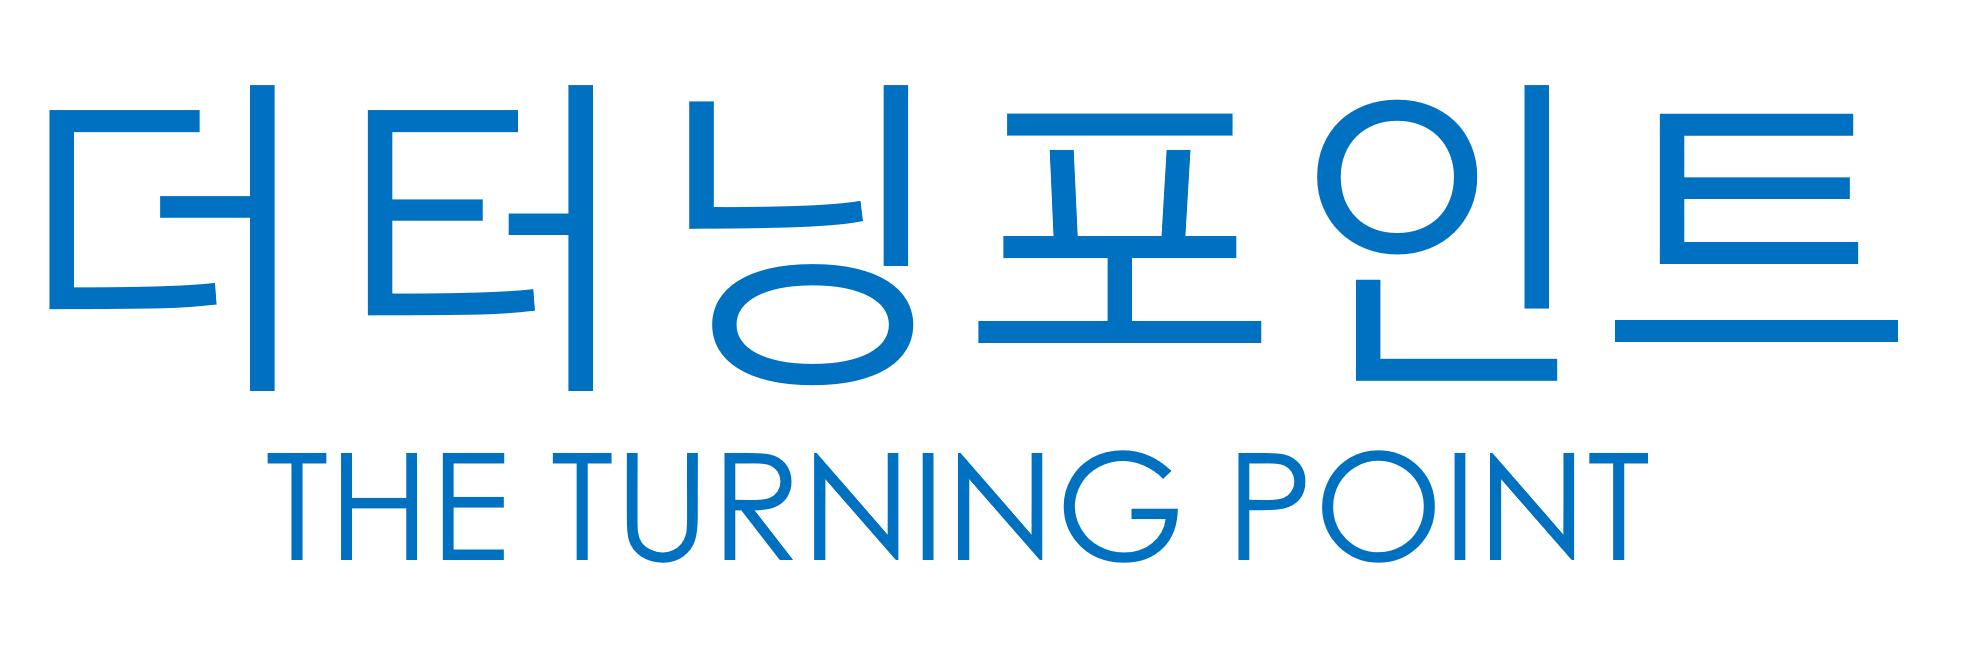 [R 502] 더터닝포인트 / 9.17(금) 3PM 대표 이미지